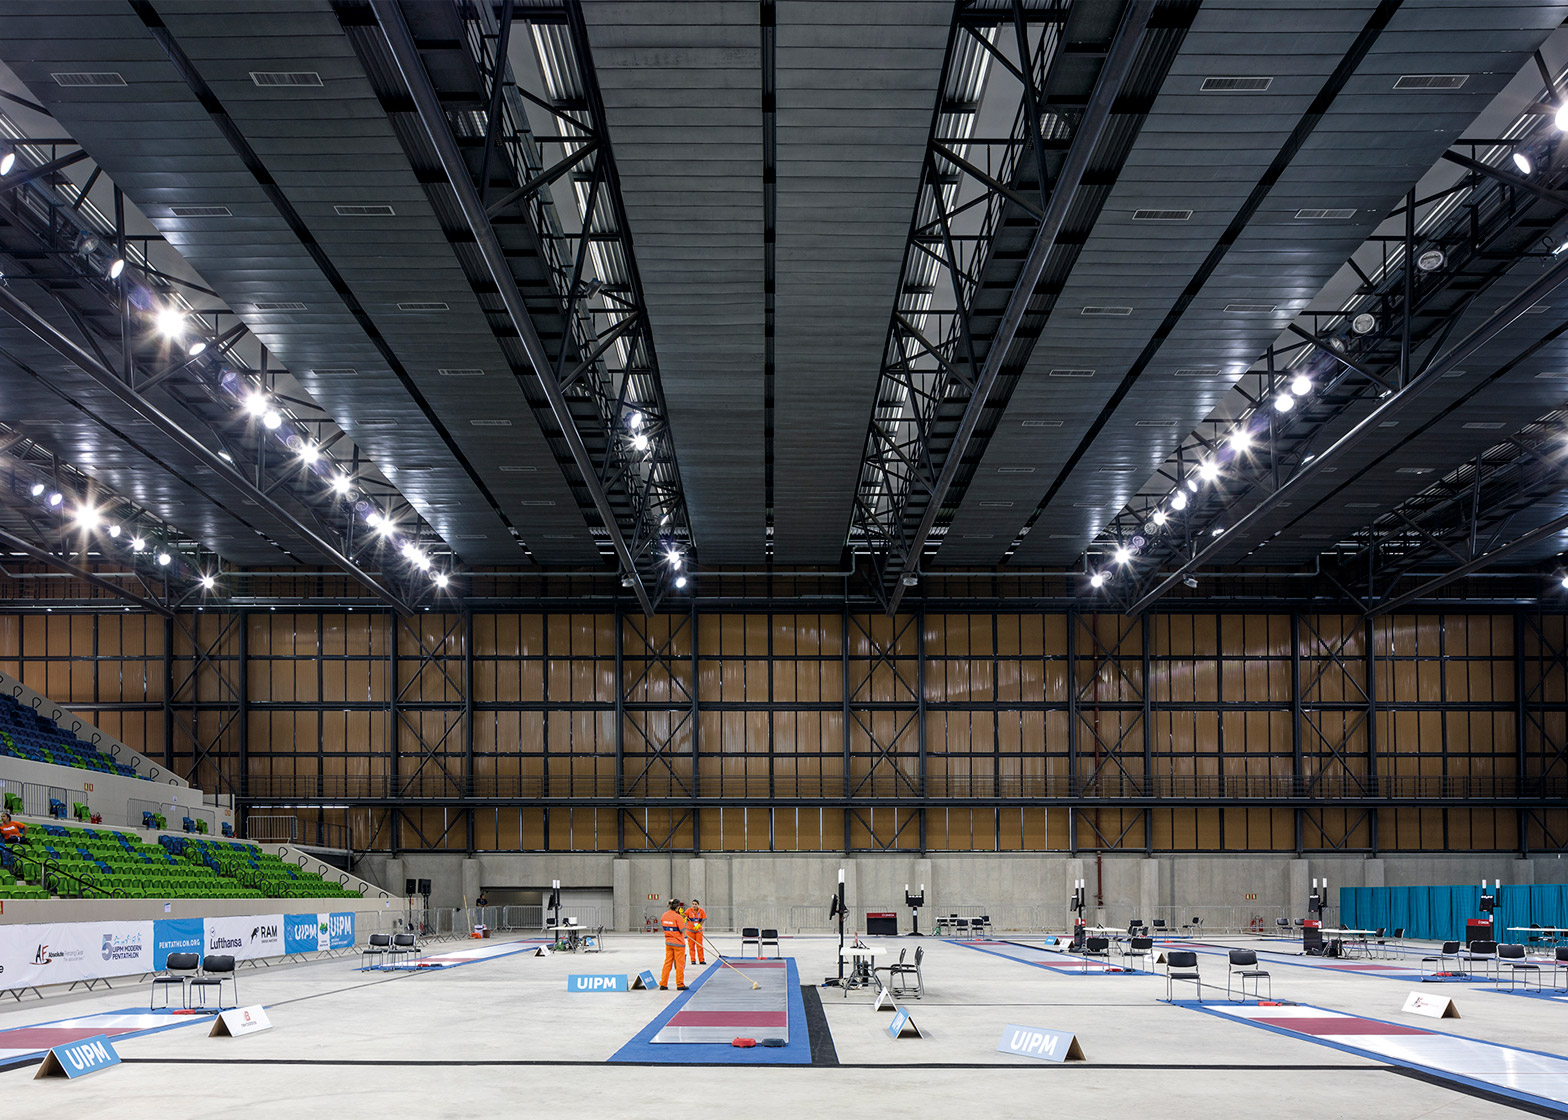 Arena Da Juventude Deodoro Olympic Park By Vigliecca Associados